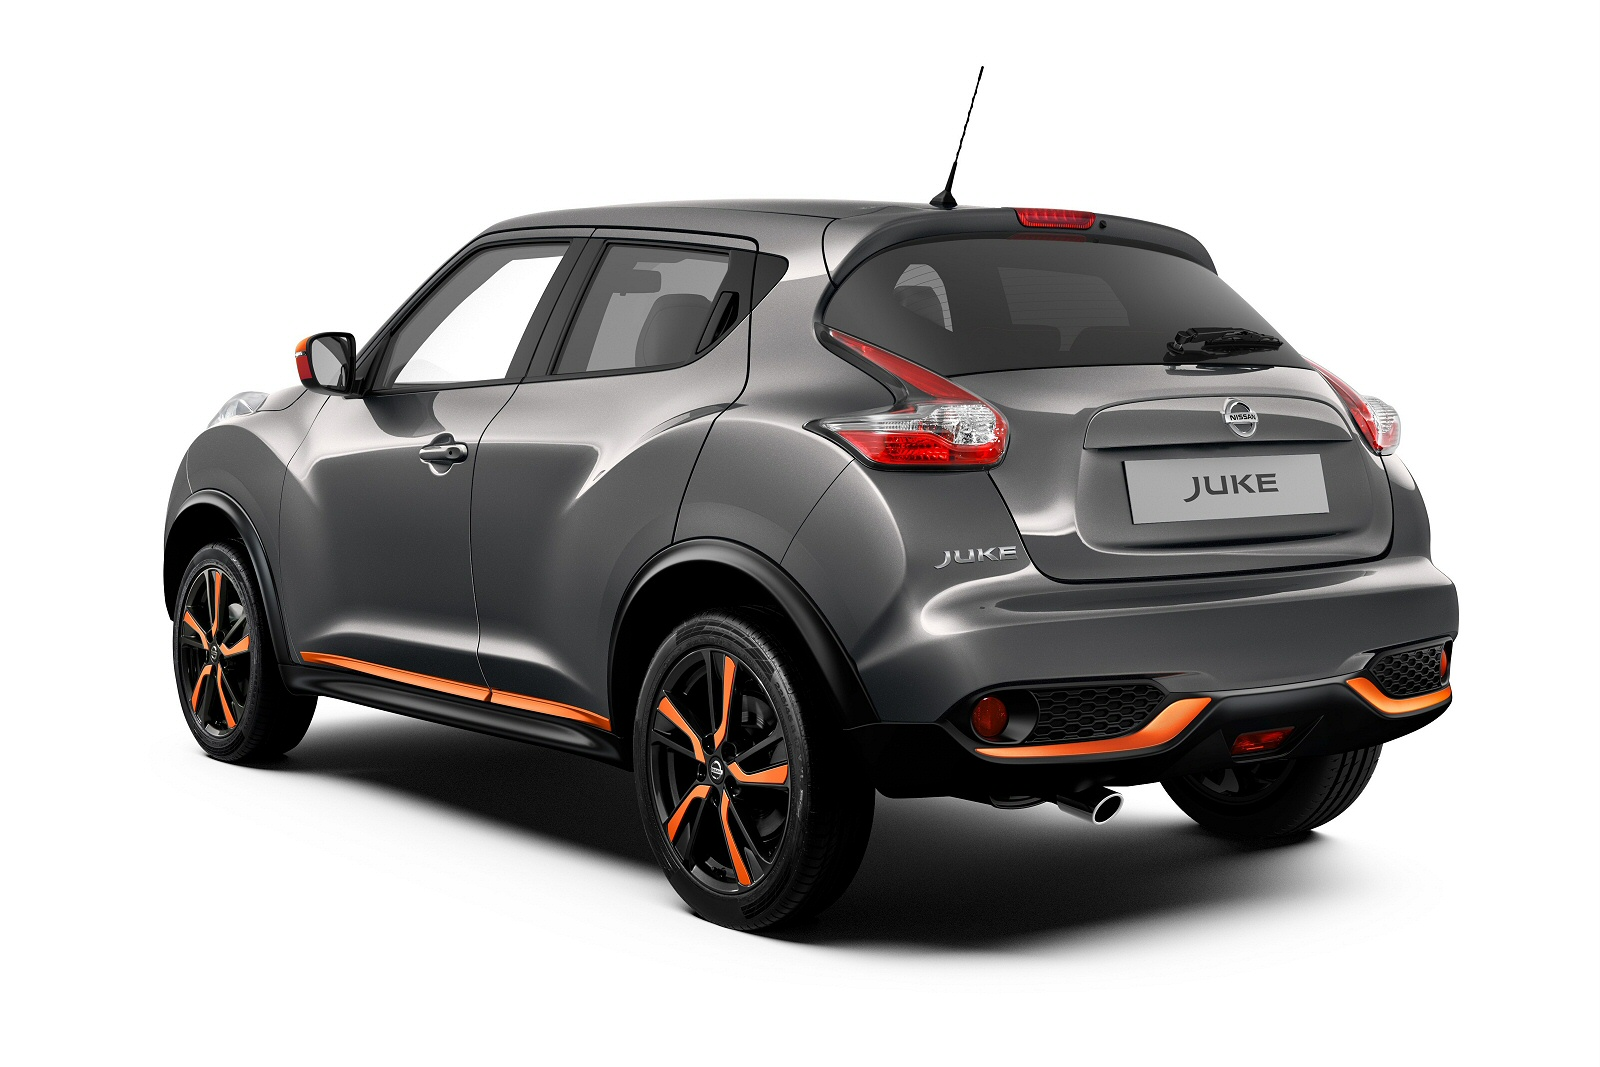 new nissan juke 1 2 dig t bose personal edition 5dr petrol. Black Bedroom Furniture Sets. Home Design Ideas